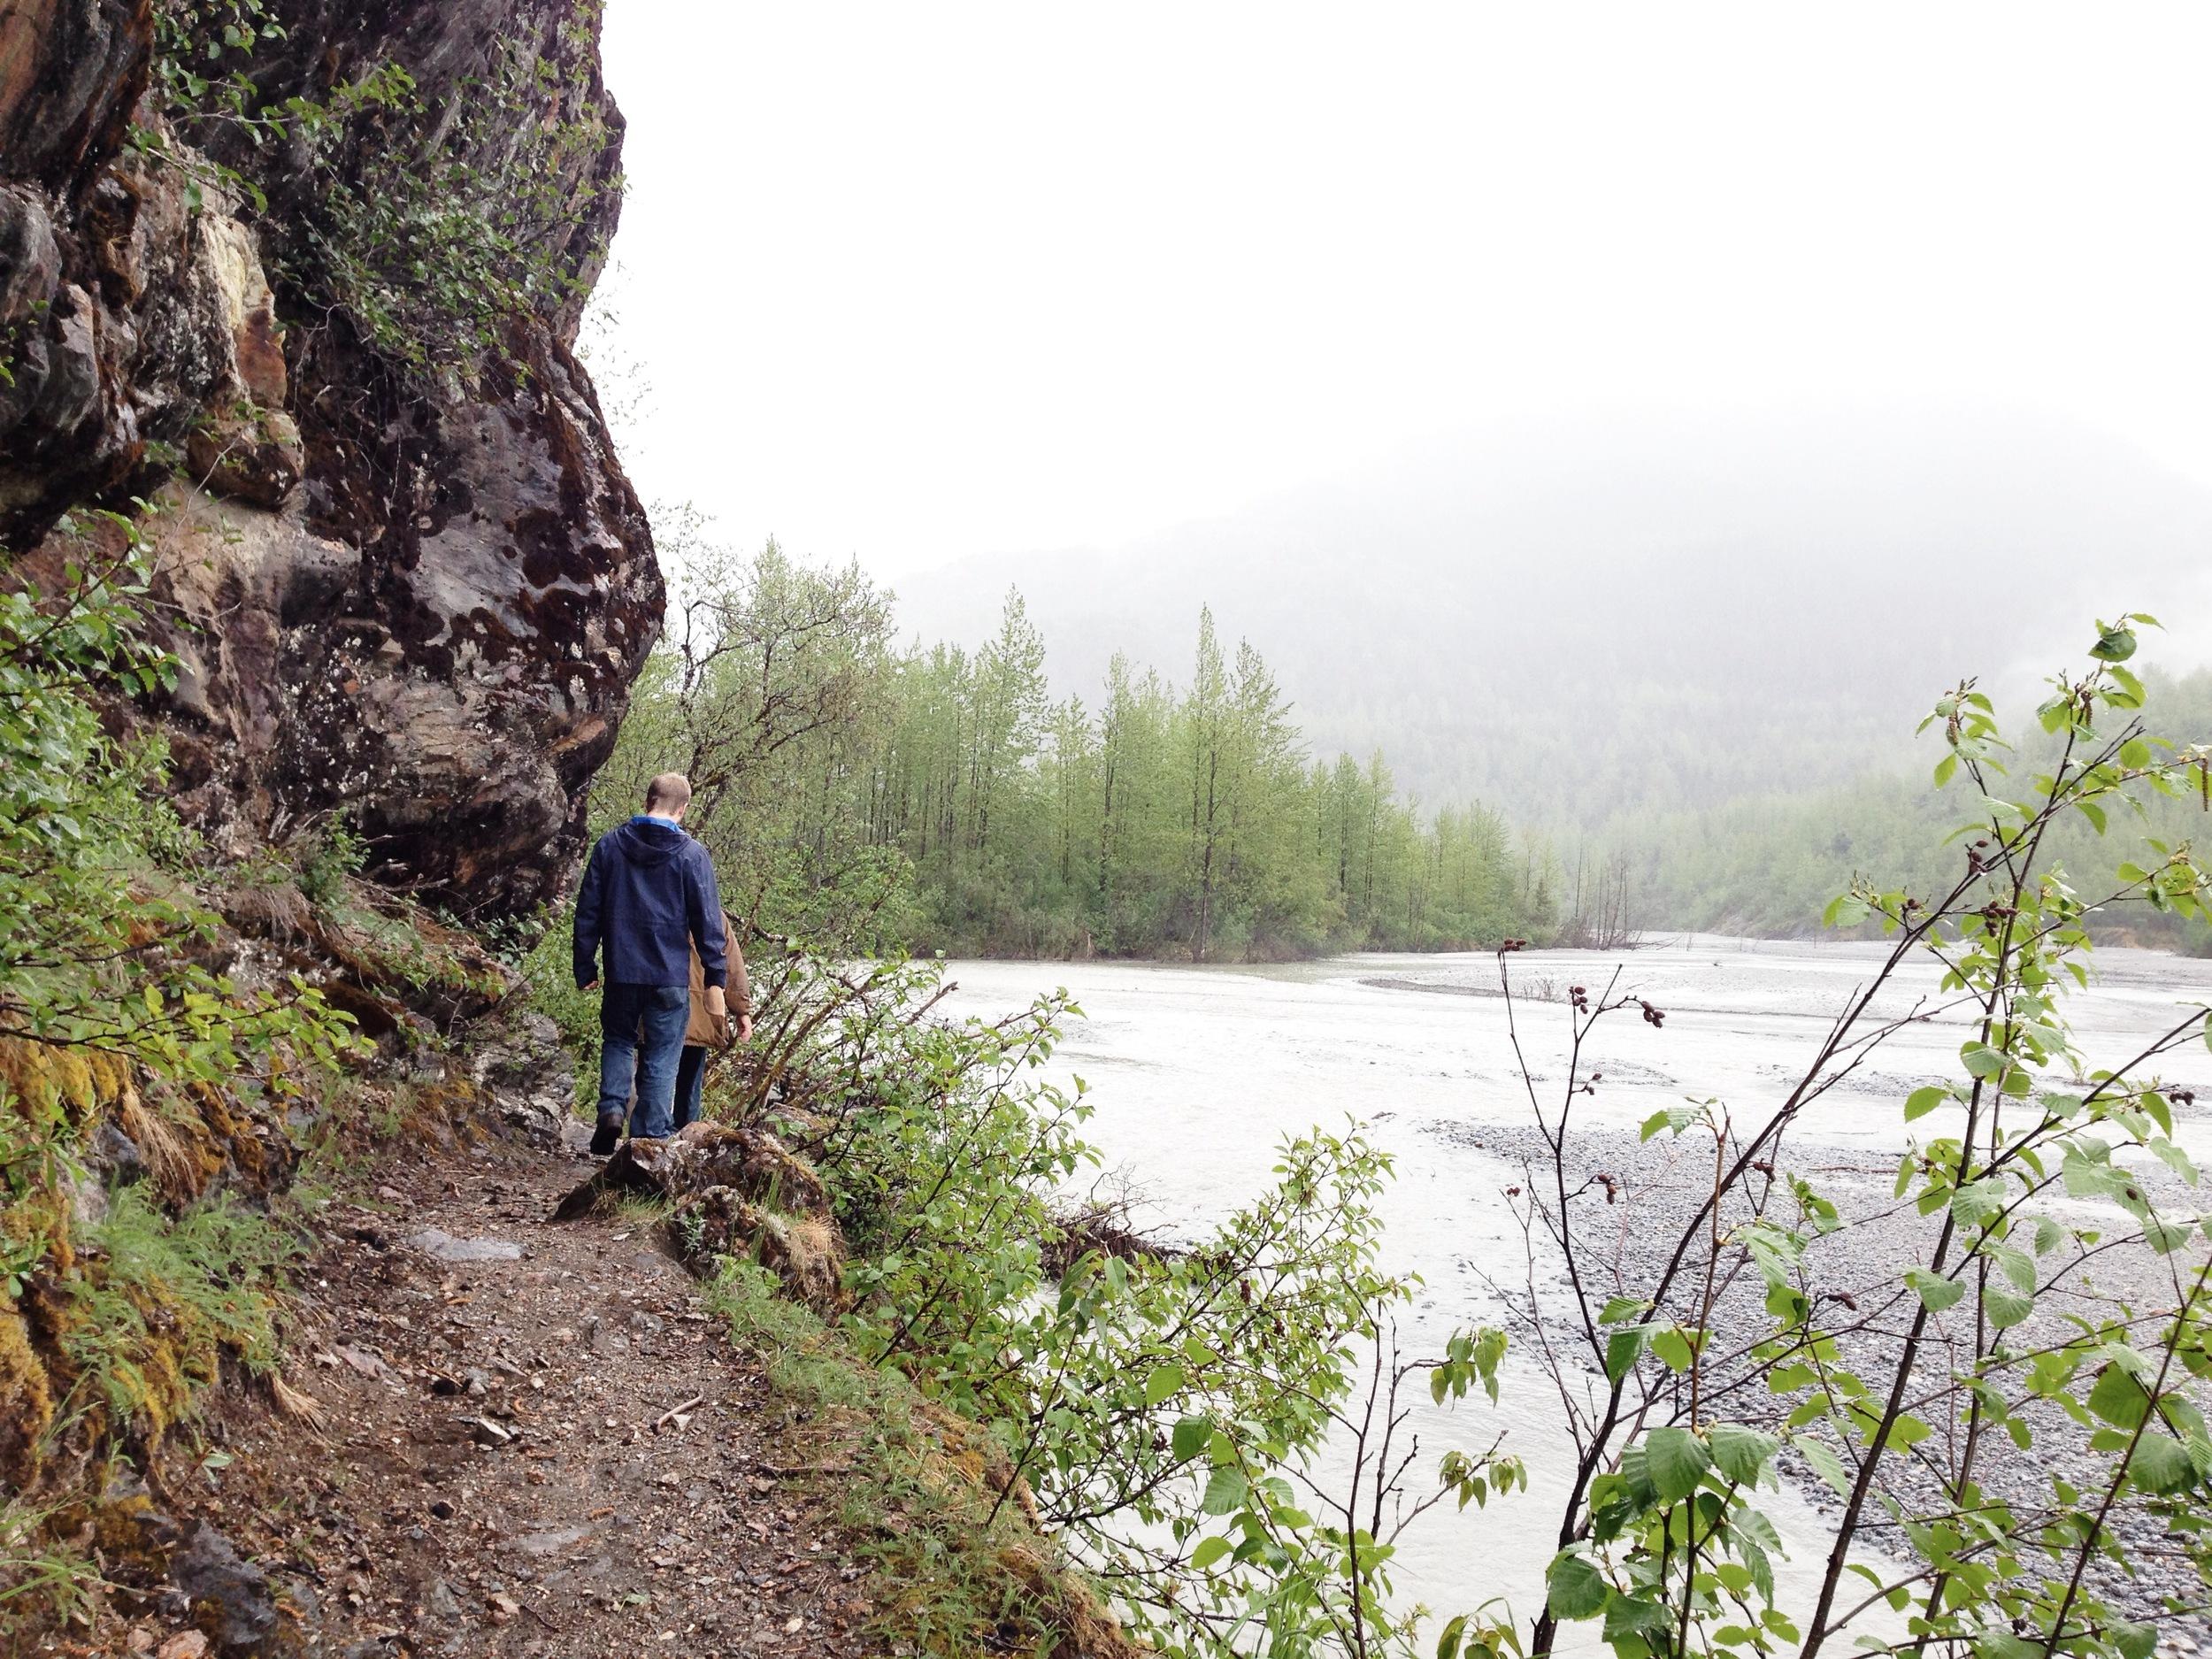 Hiking in Juneau, Alaska ↠ Herbert Glacier Trail | MALLORIE OWENS